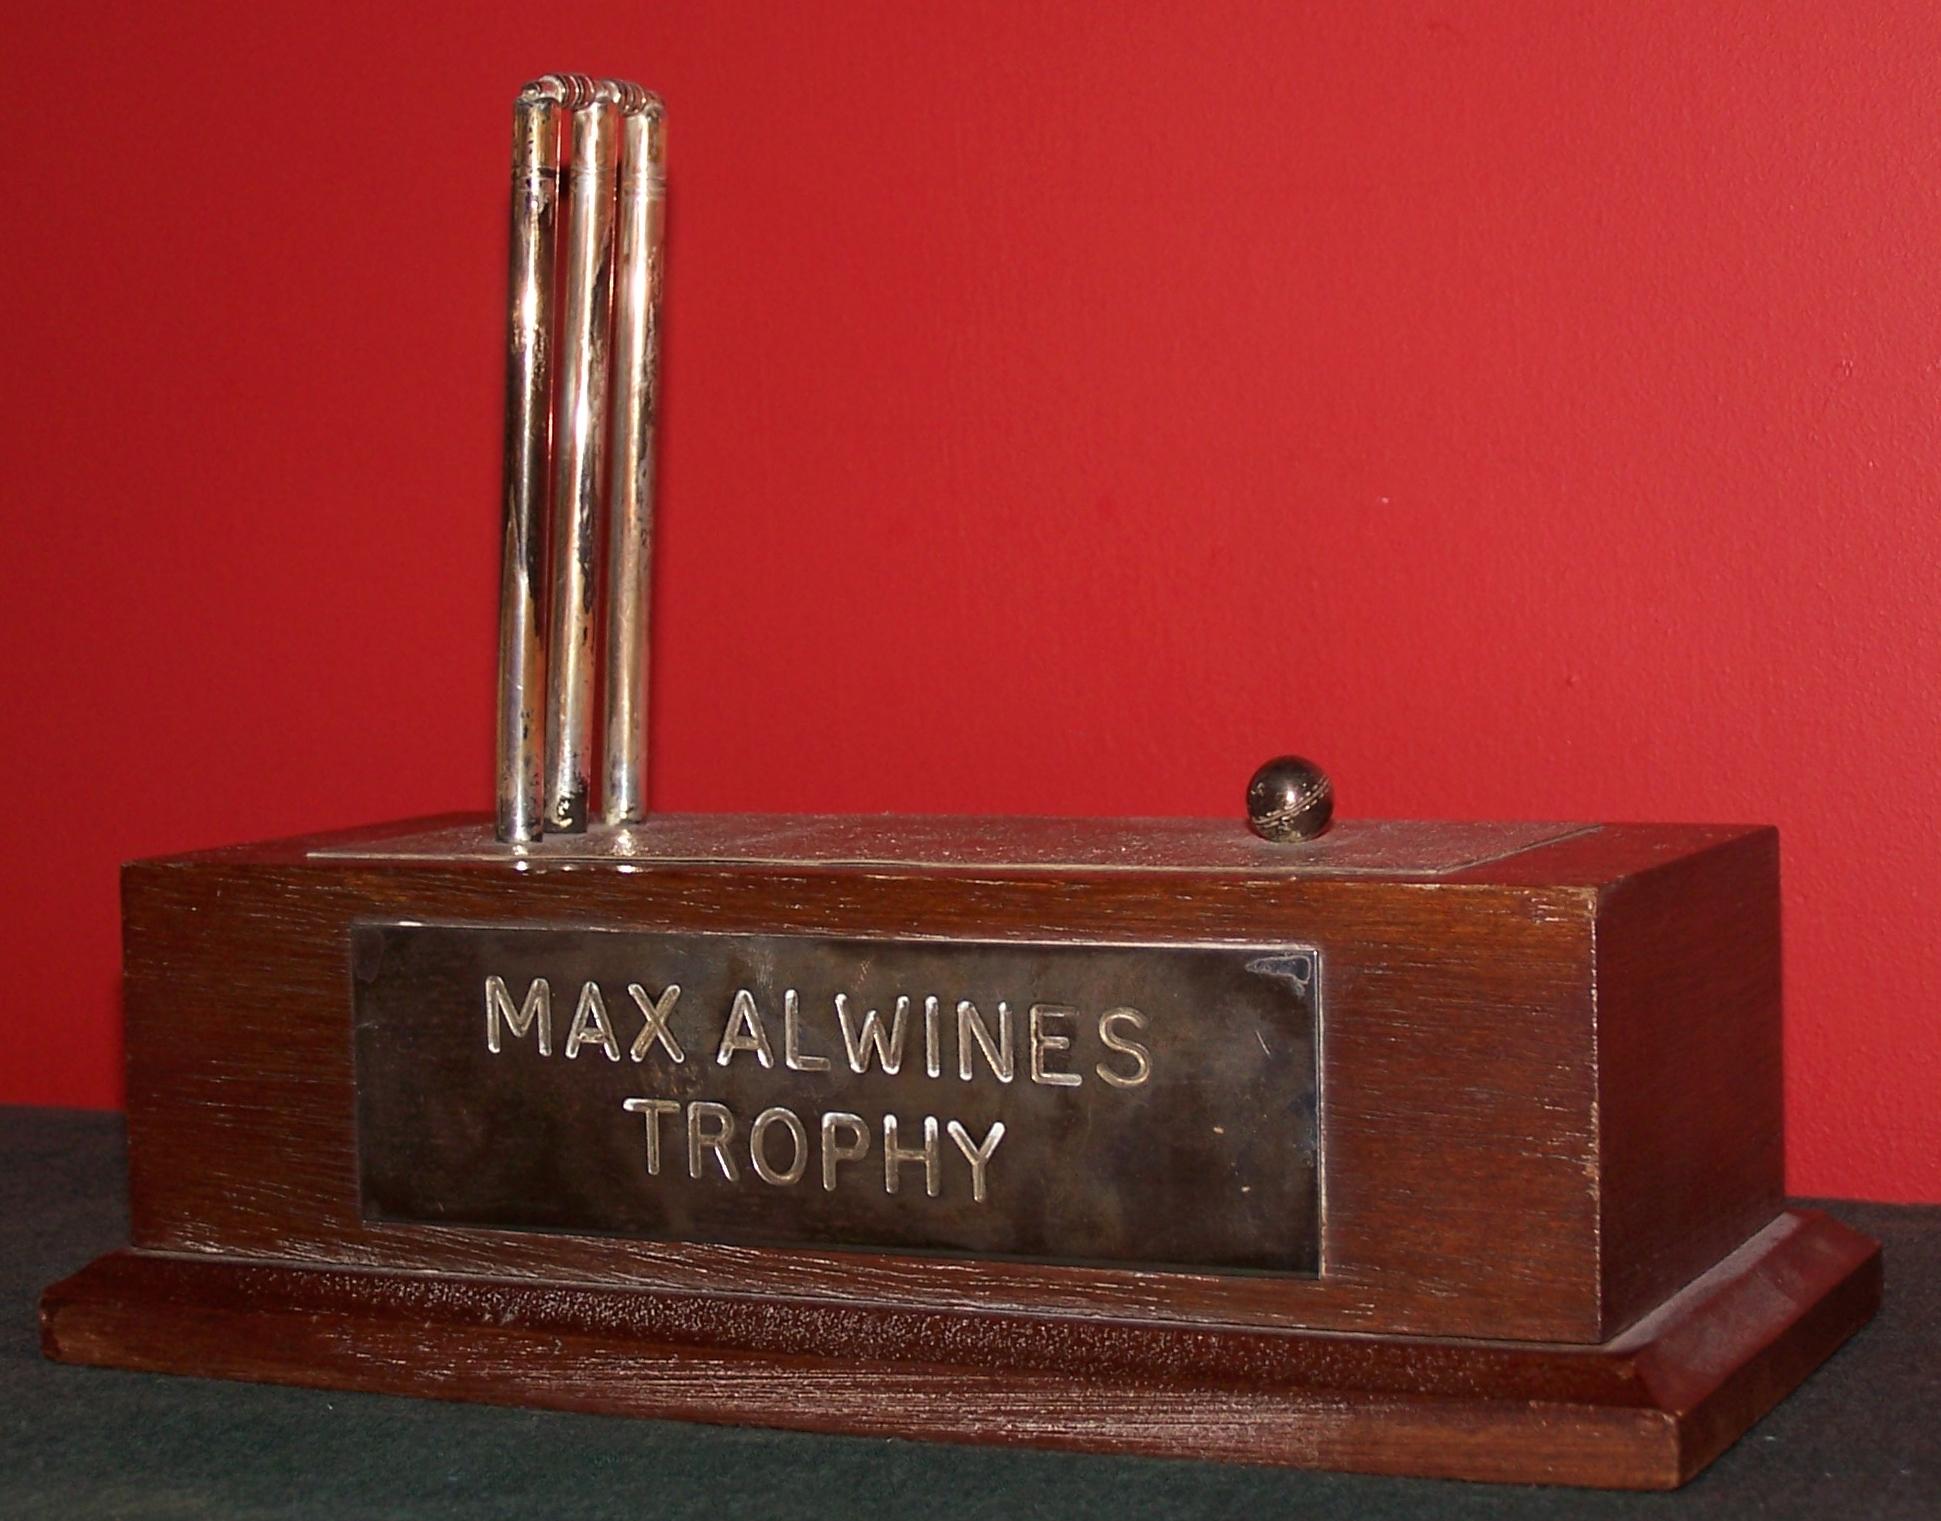 Max Alwins Trophy